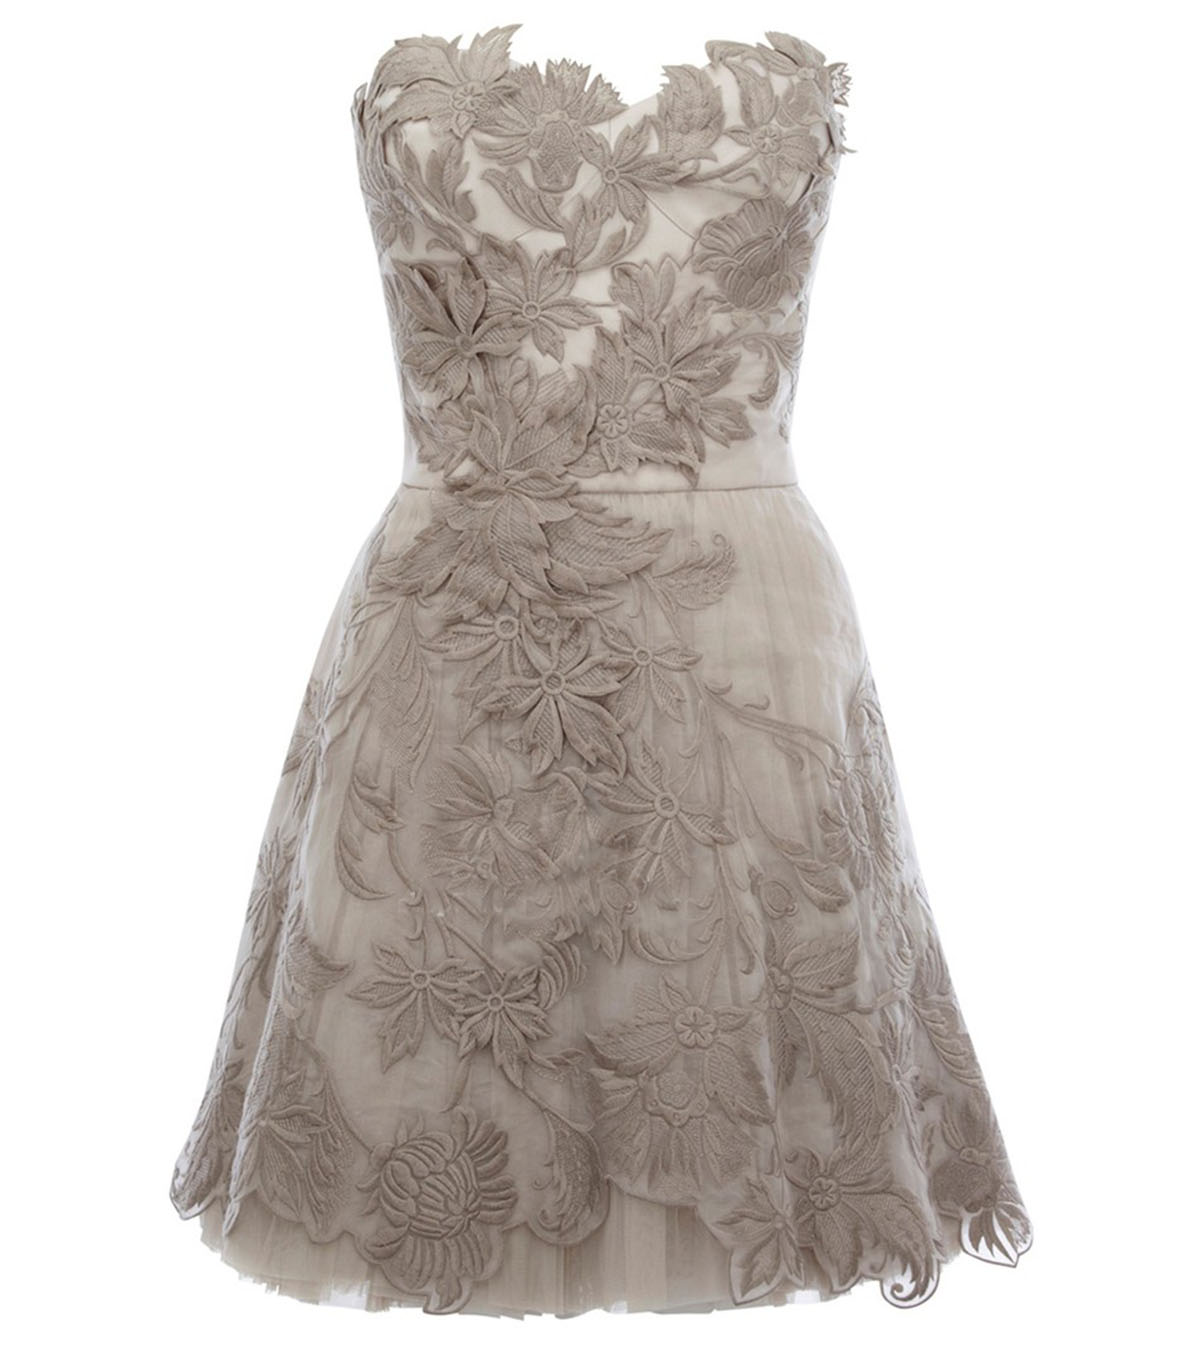 Wedding Gray Lace Dress wedding dress grey lace overlay dresses 15